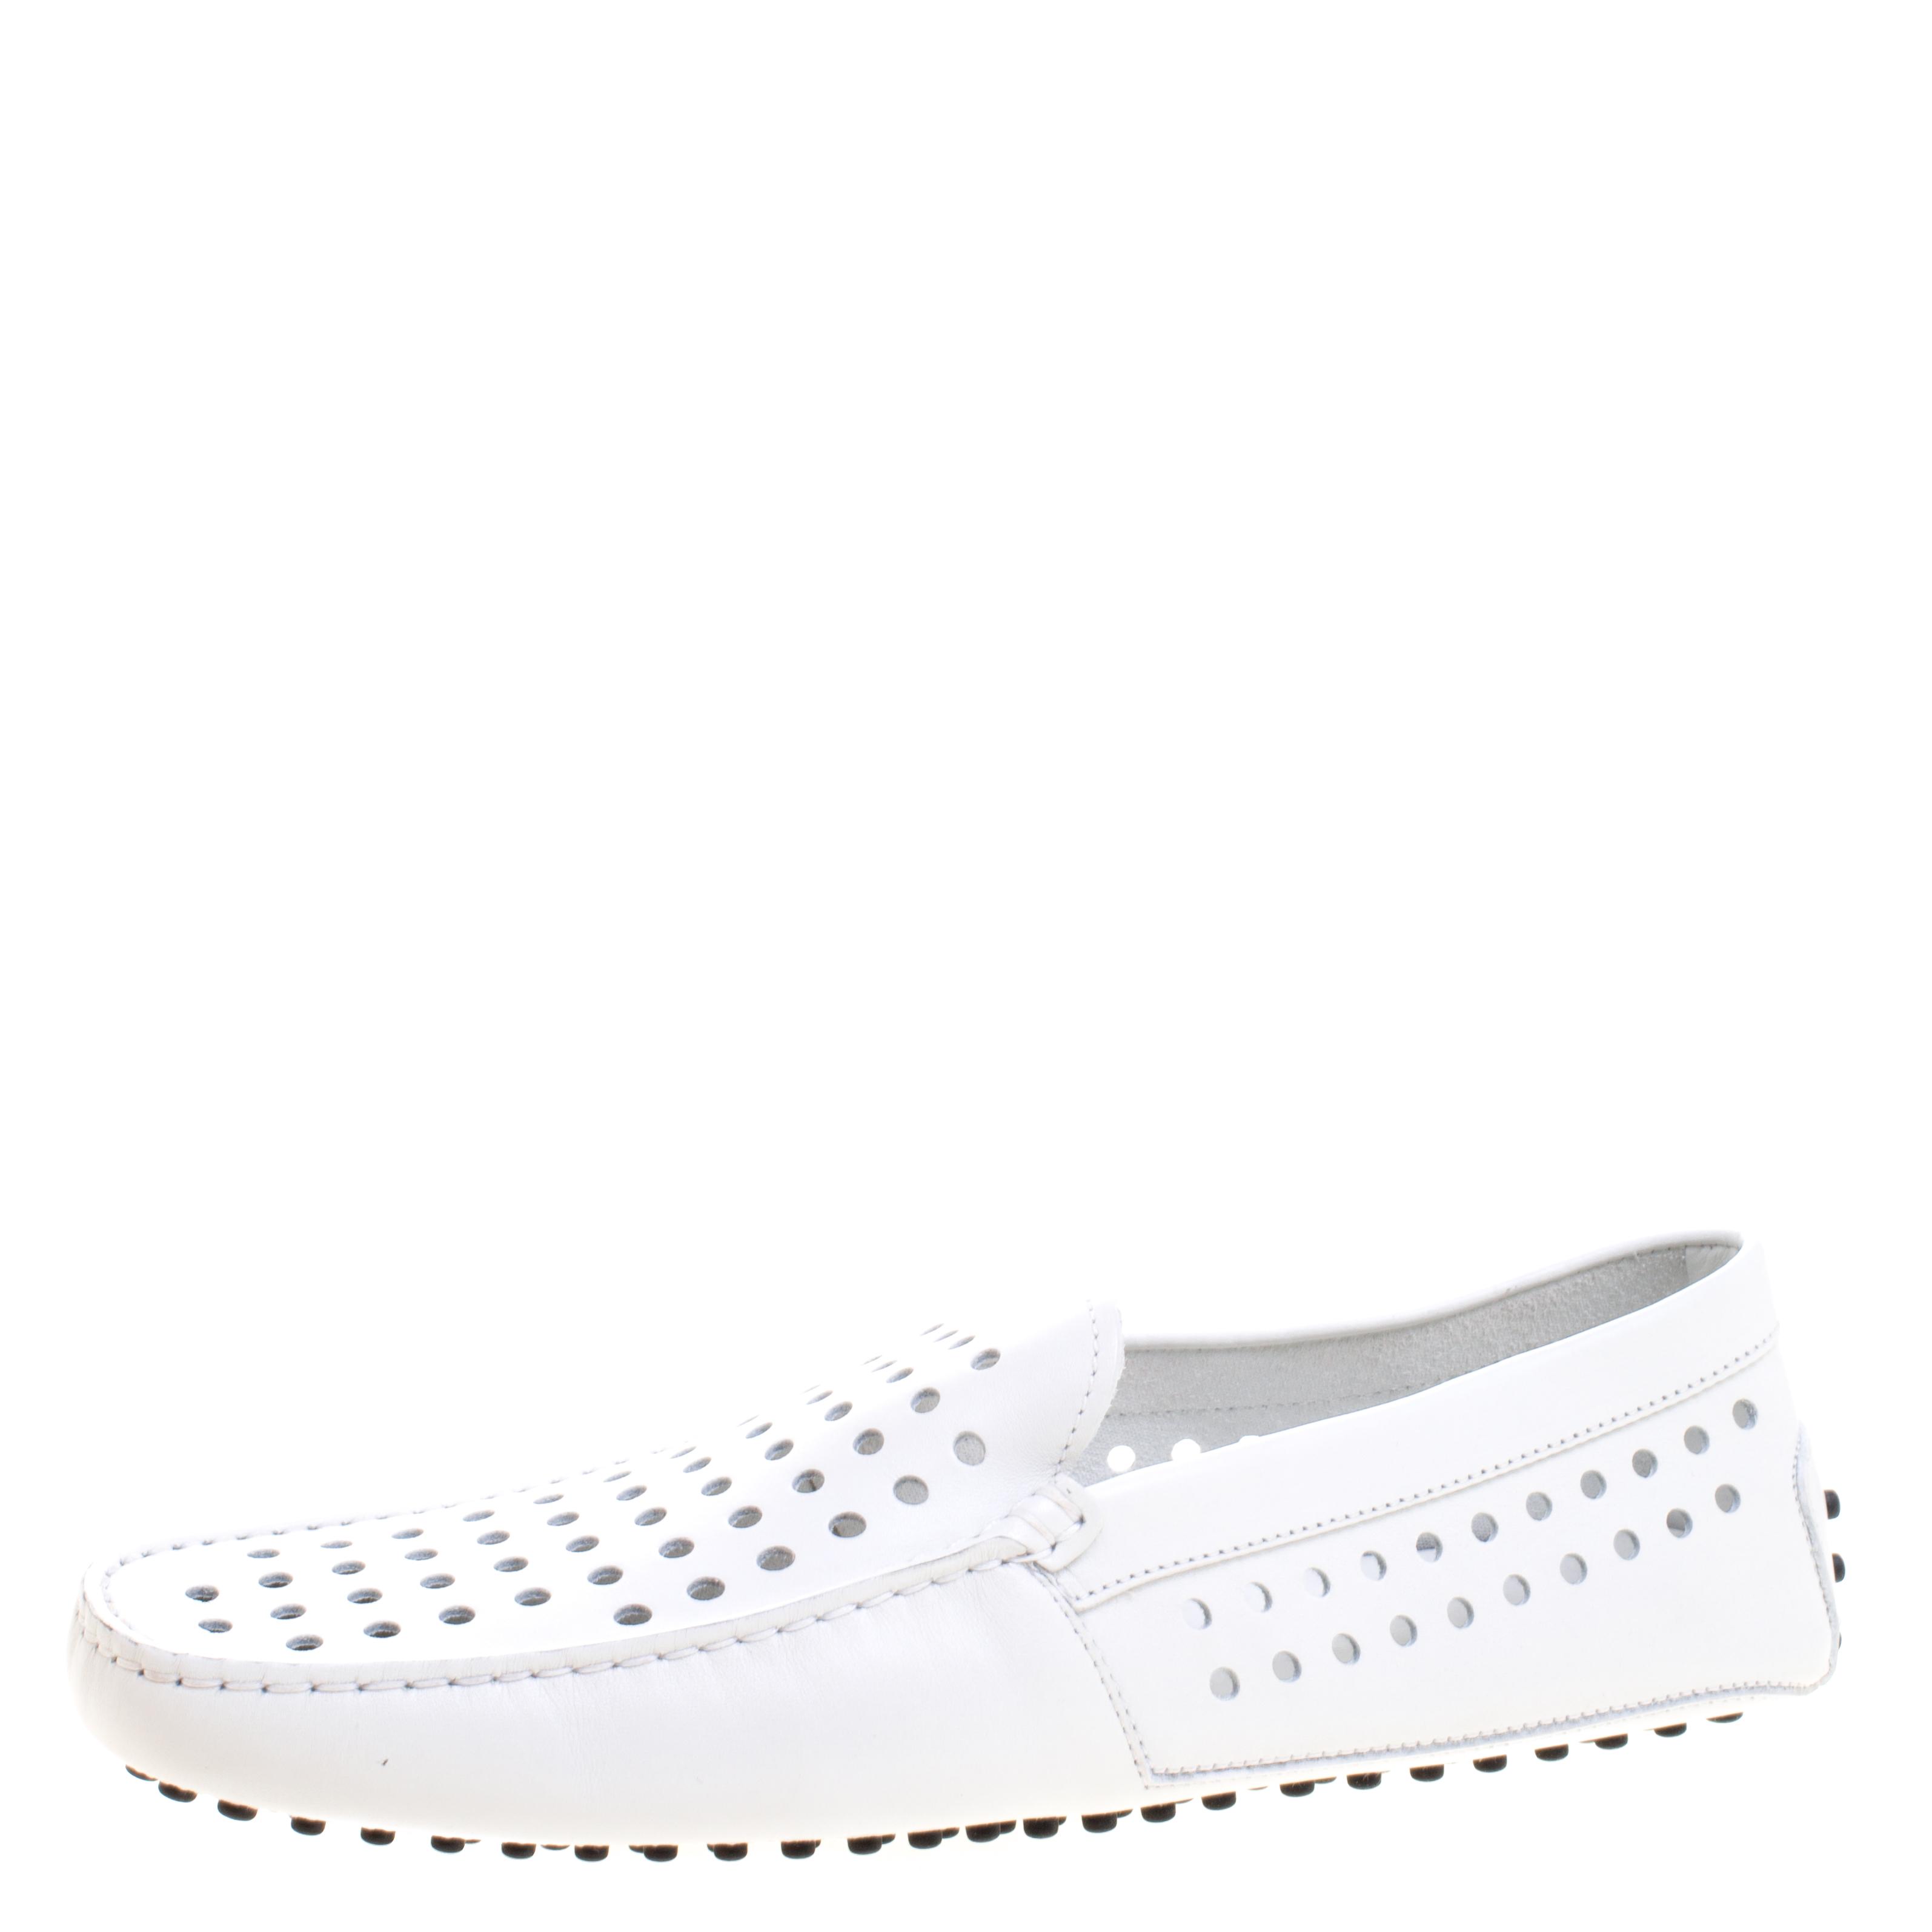 a5f8b456a إشتري حذاء لوفرز تودز جلد أبيض مثقب مقاس 43 110526 بأفضل الاسعار ...